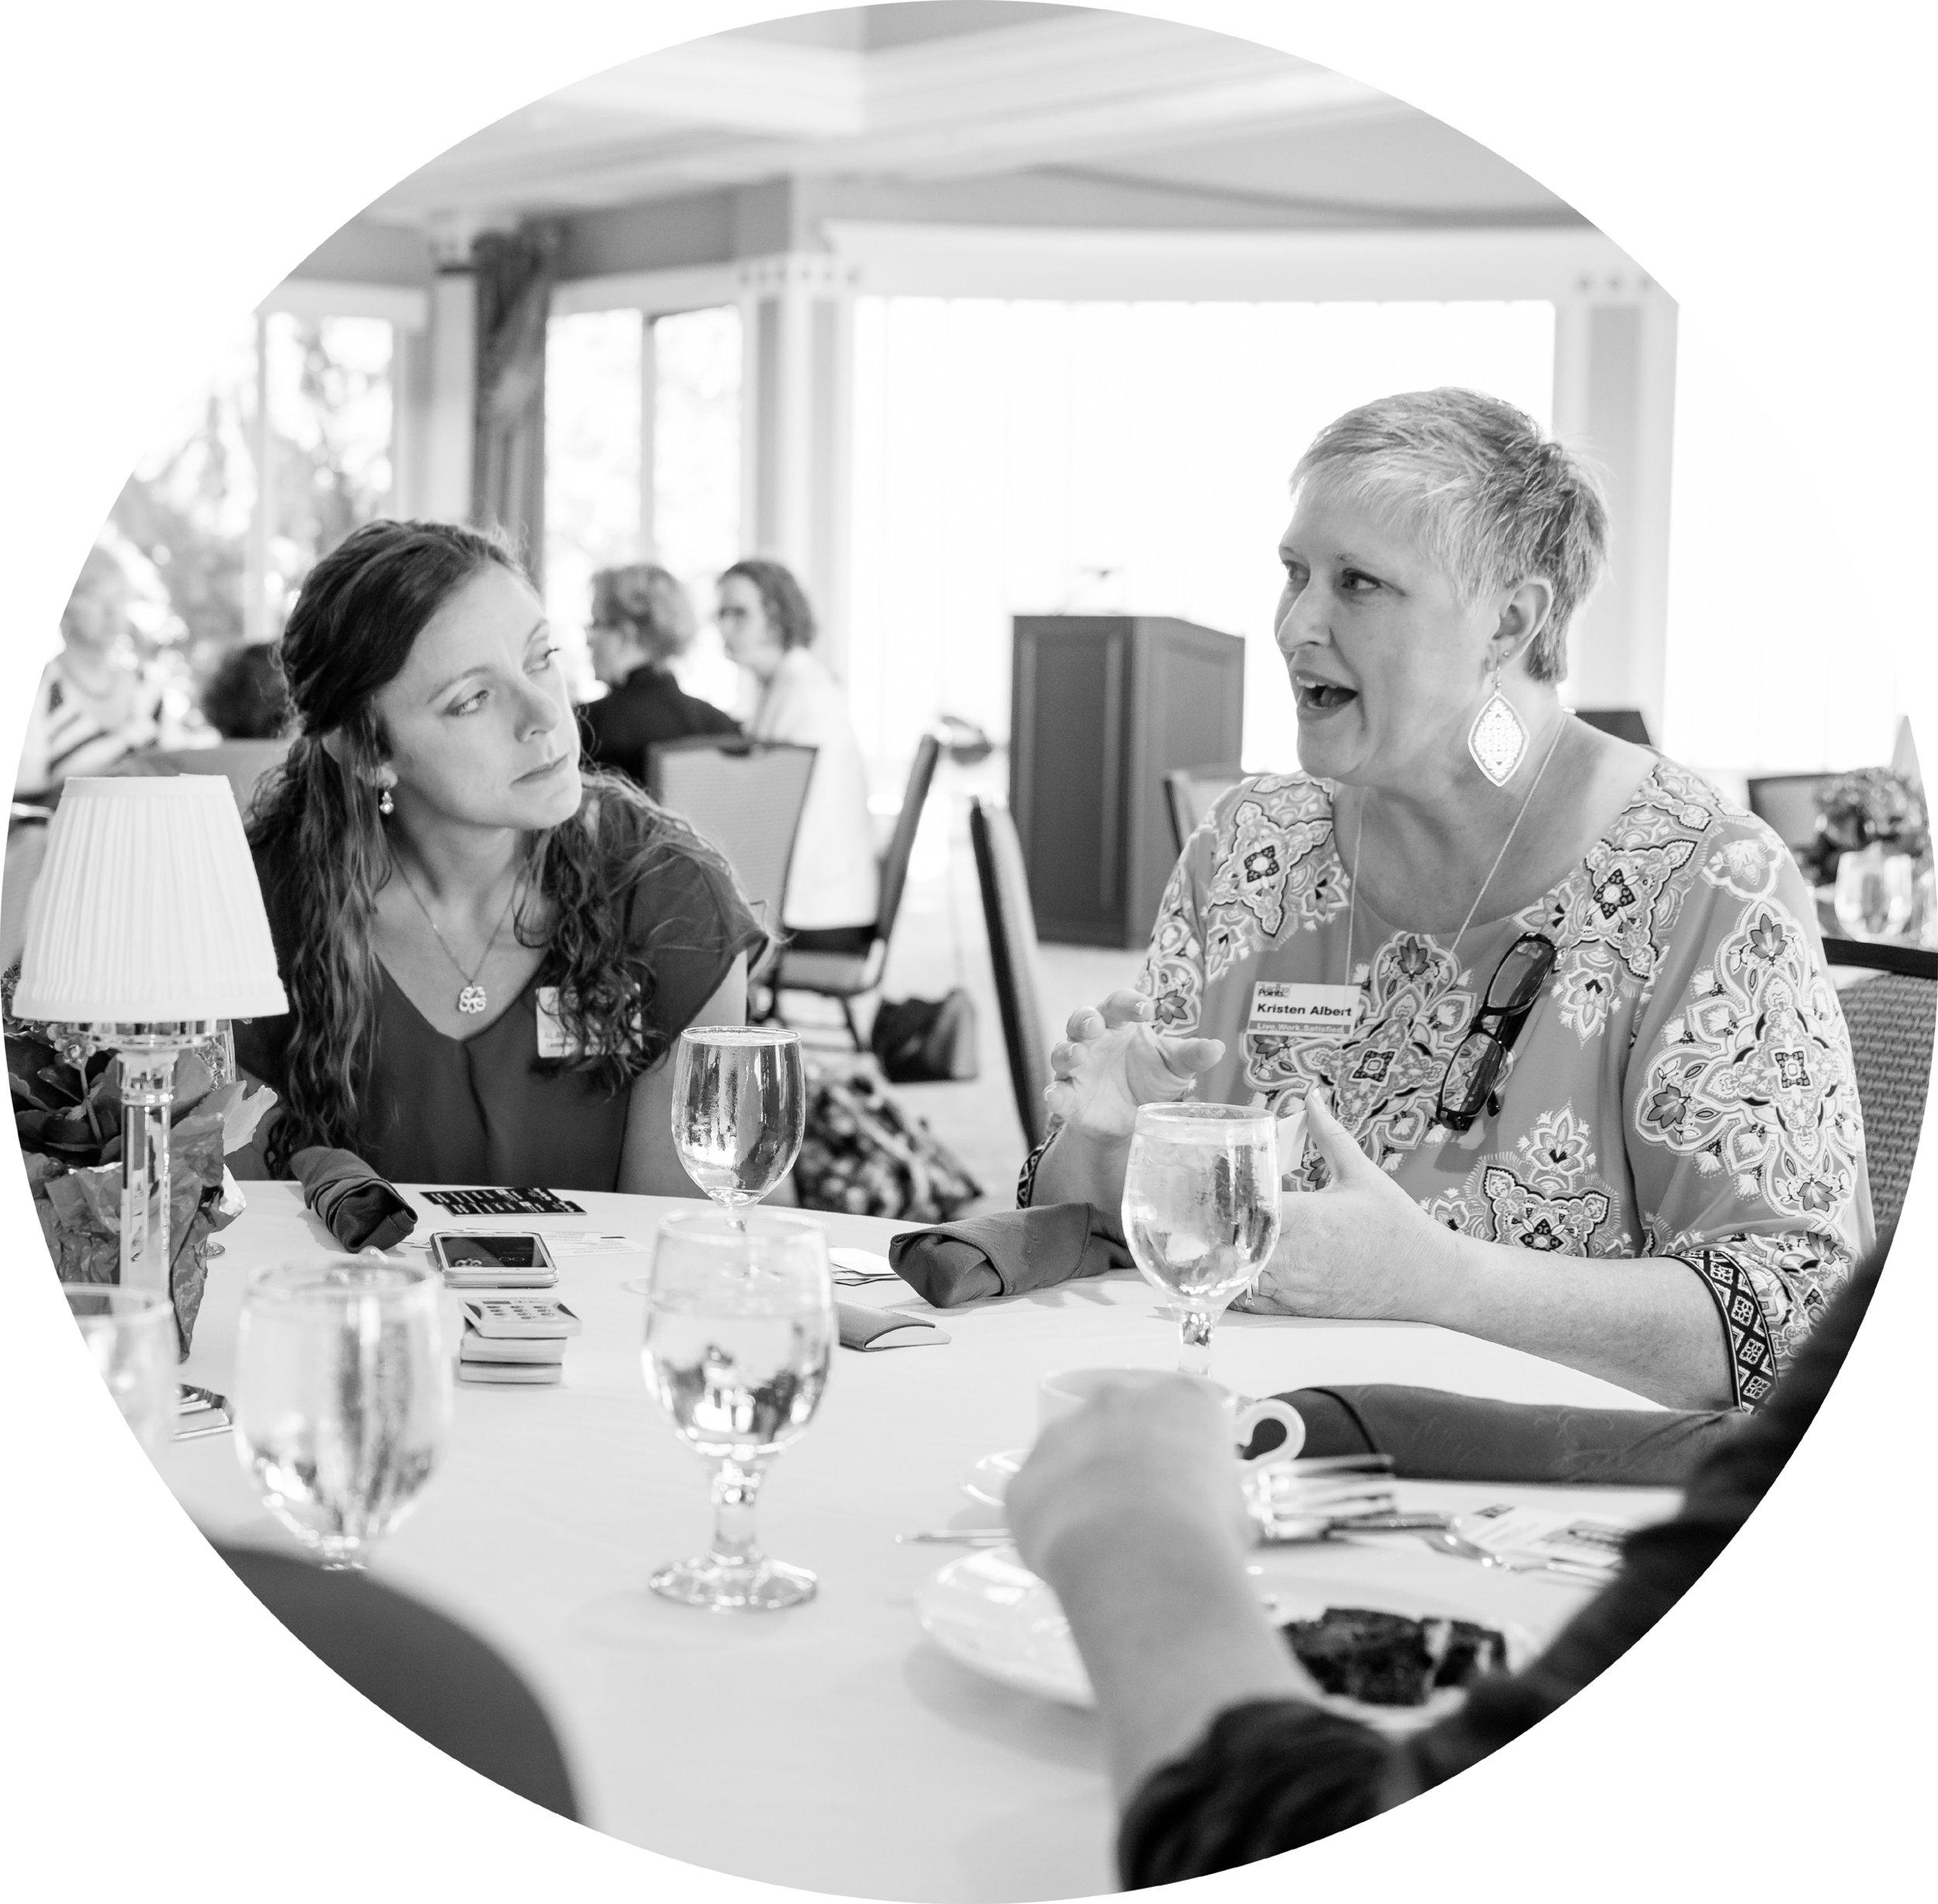 women_eating_at_table_round_BW.jpg